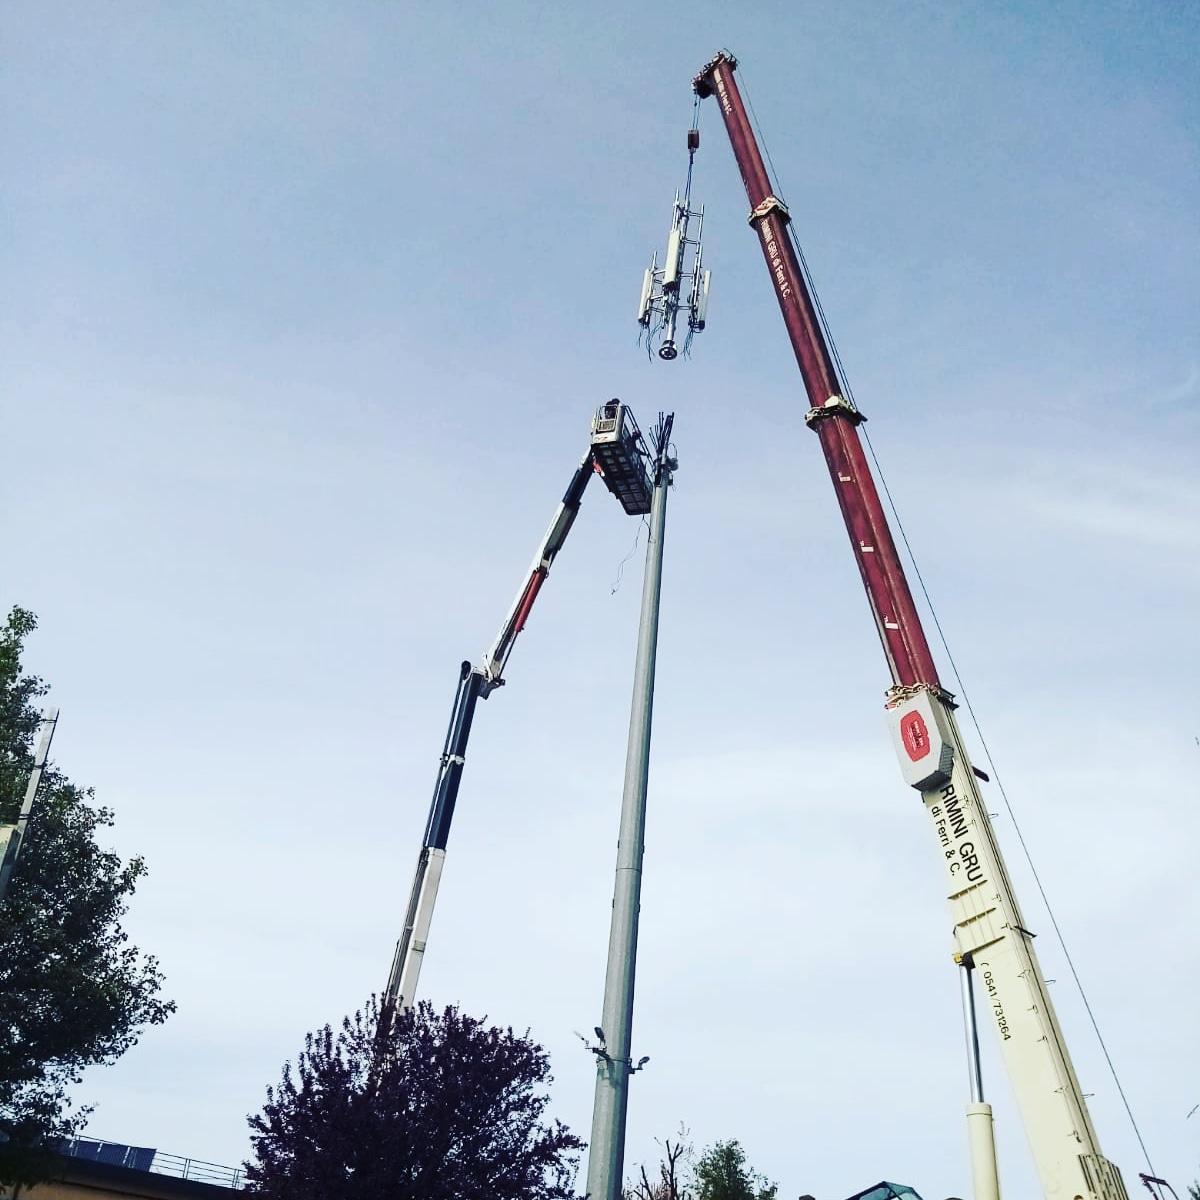 Rimini Gru noleggio autogru e piattaforma telefonia emilia romagna e marche